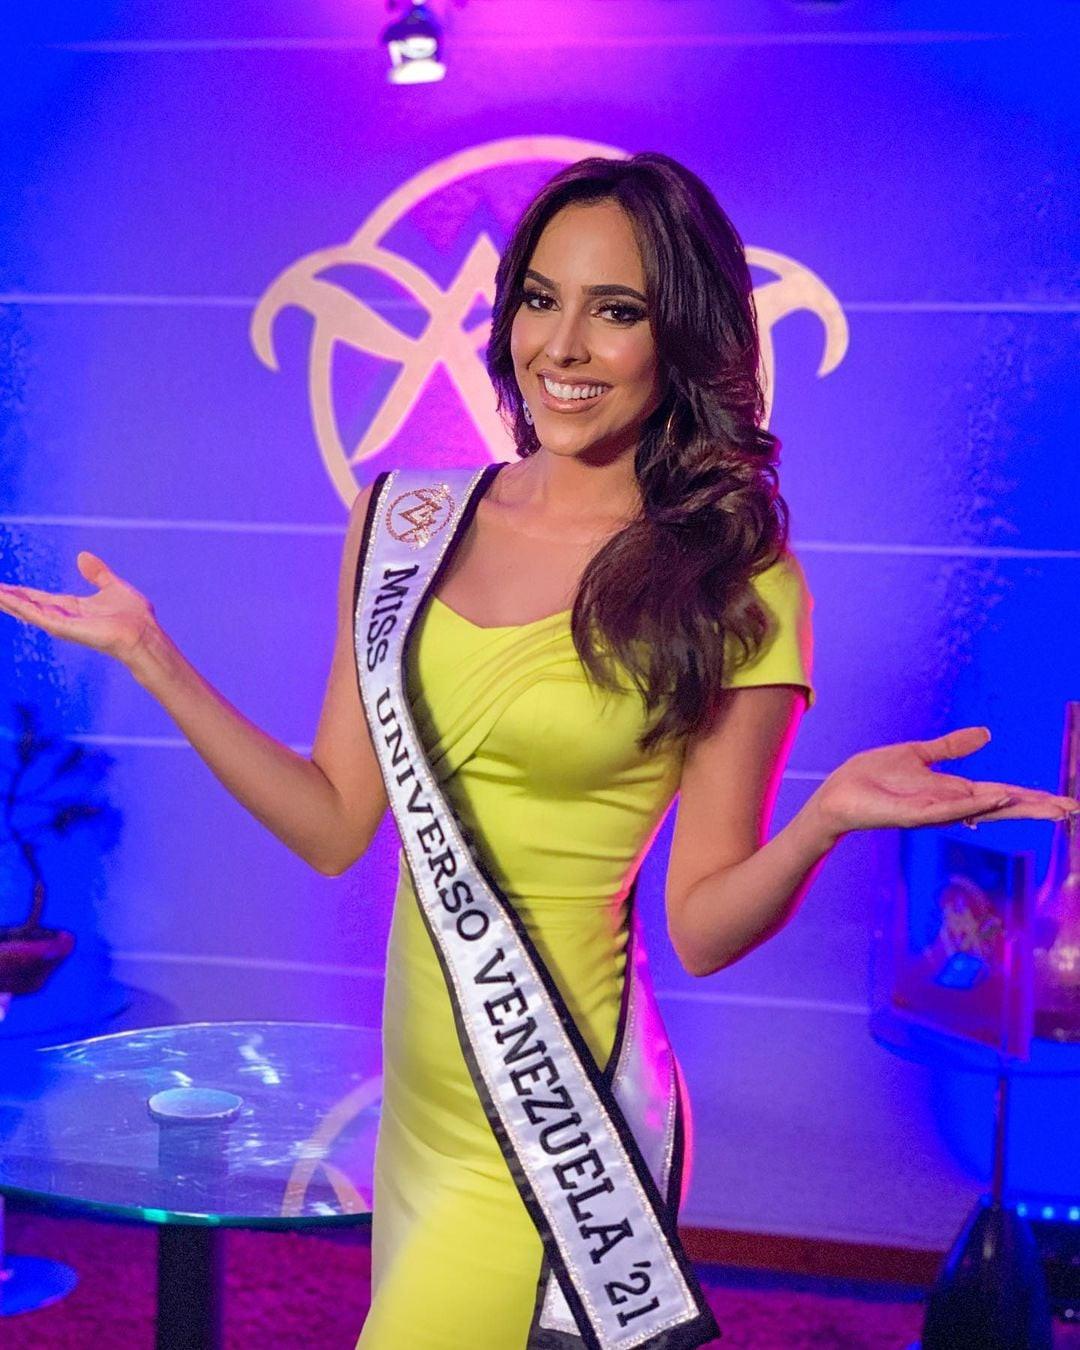 luiseth materan, miss universe venezuela 2021. Oozckb10